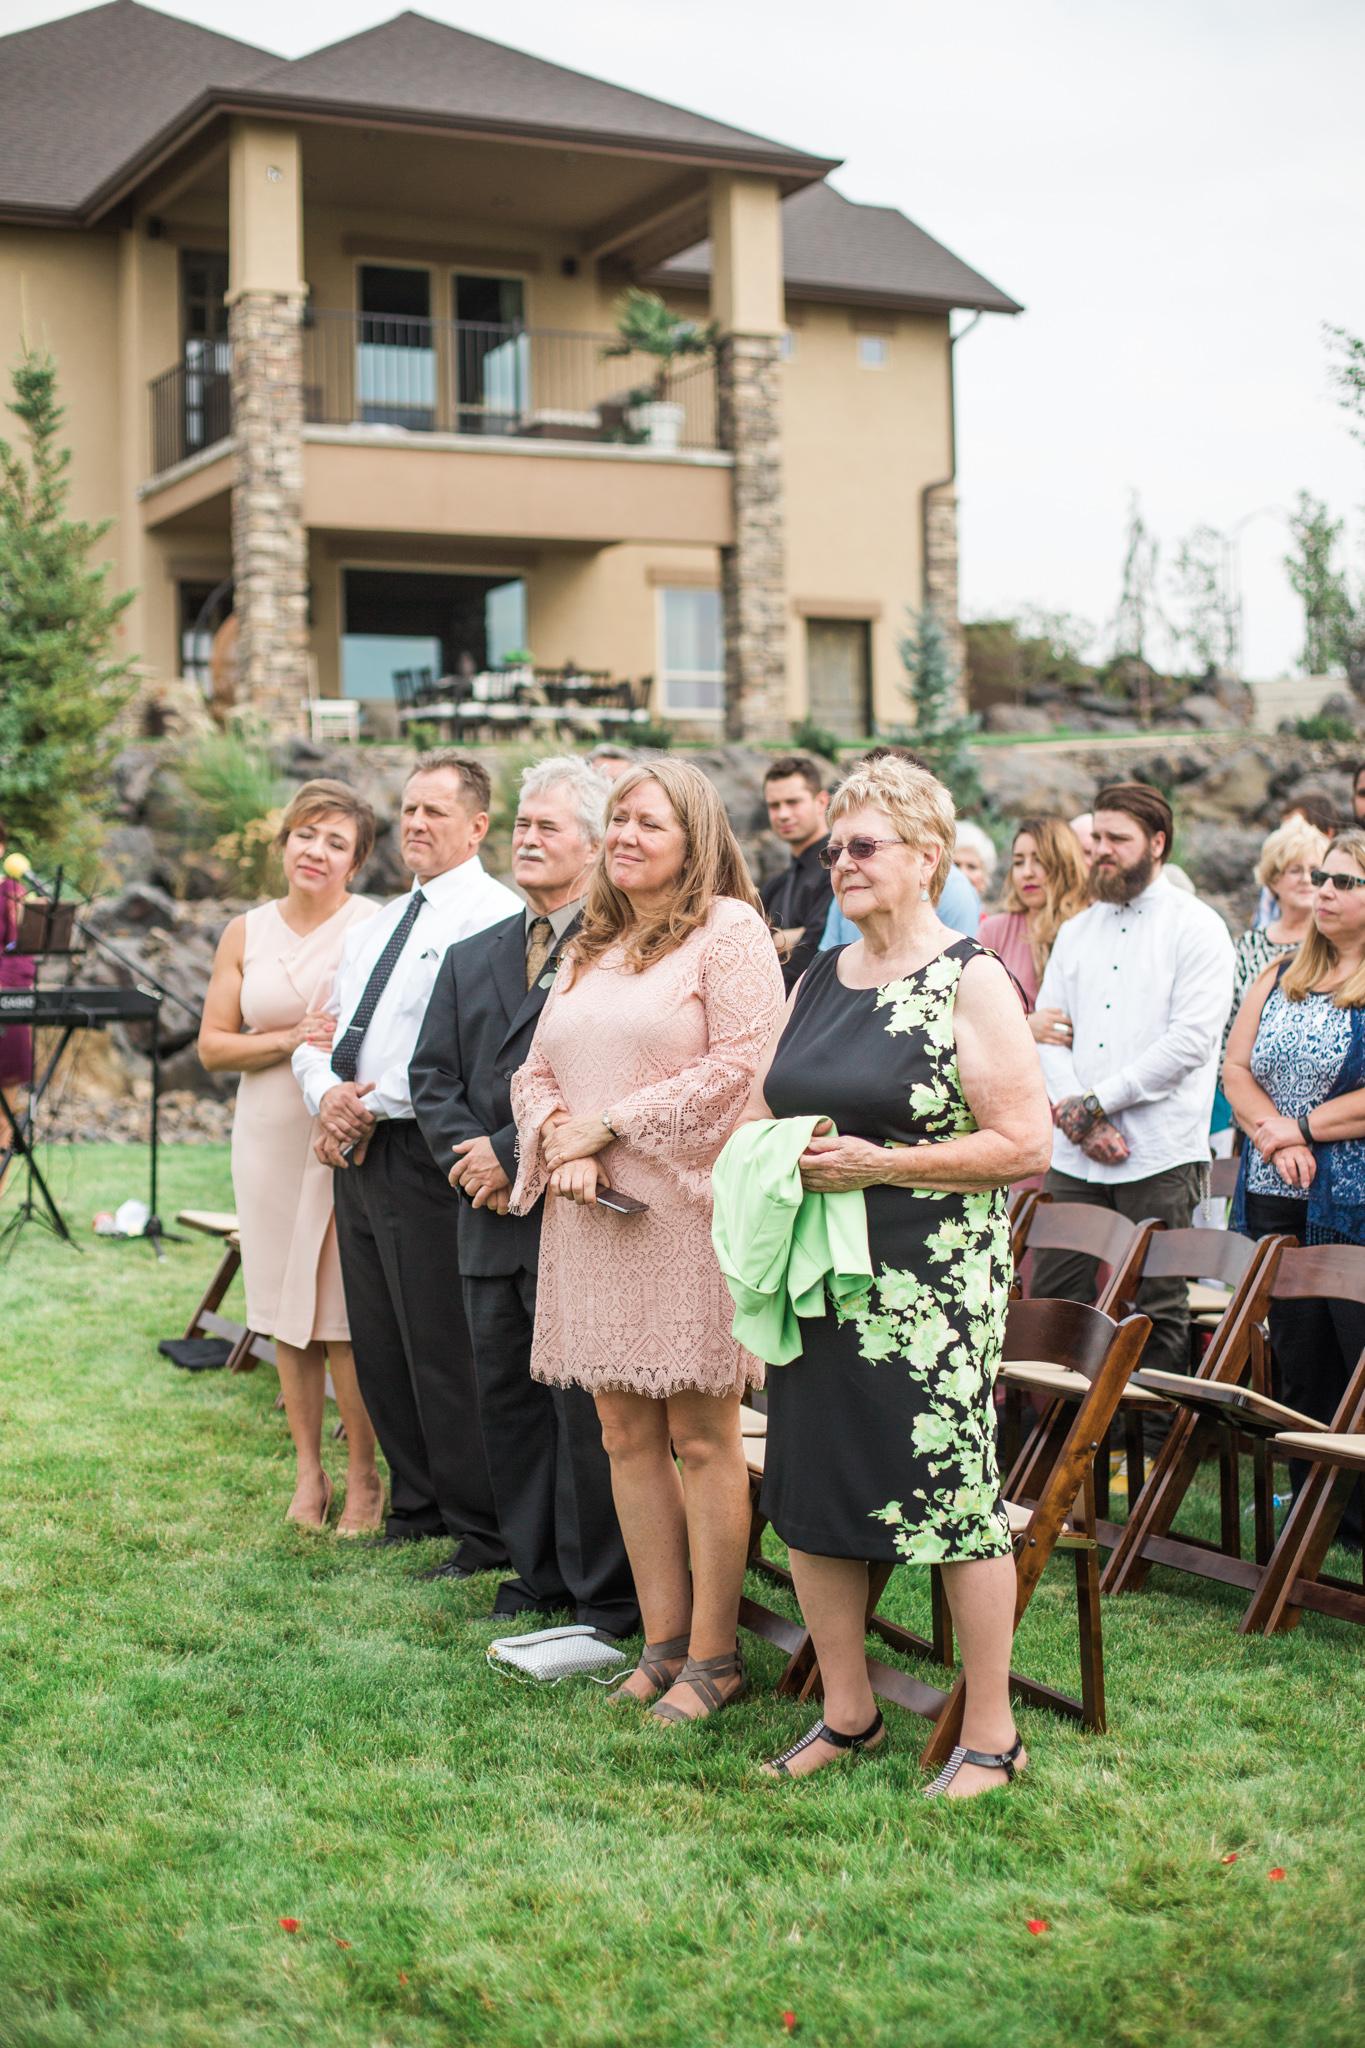 Olga_janni_wedding_090917_WEBSIZE (321 of 704).JPG